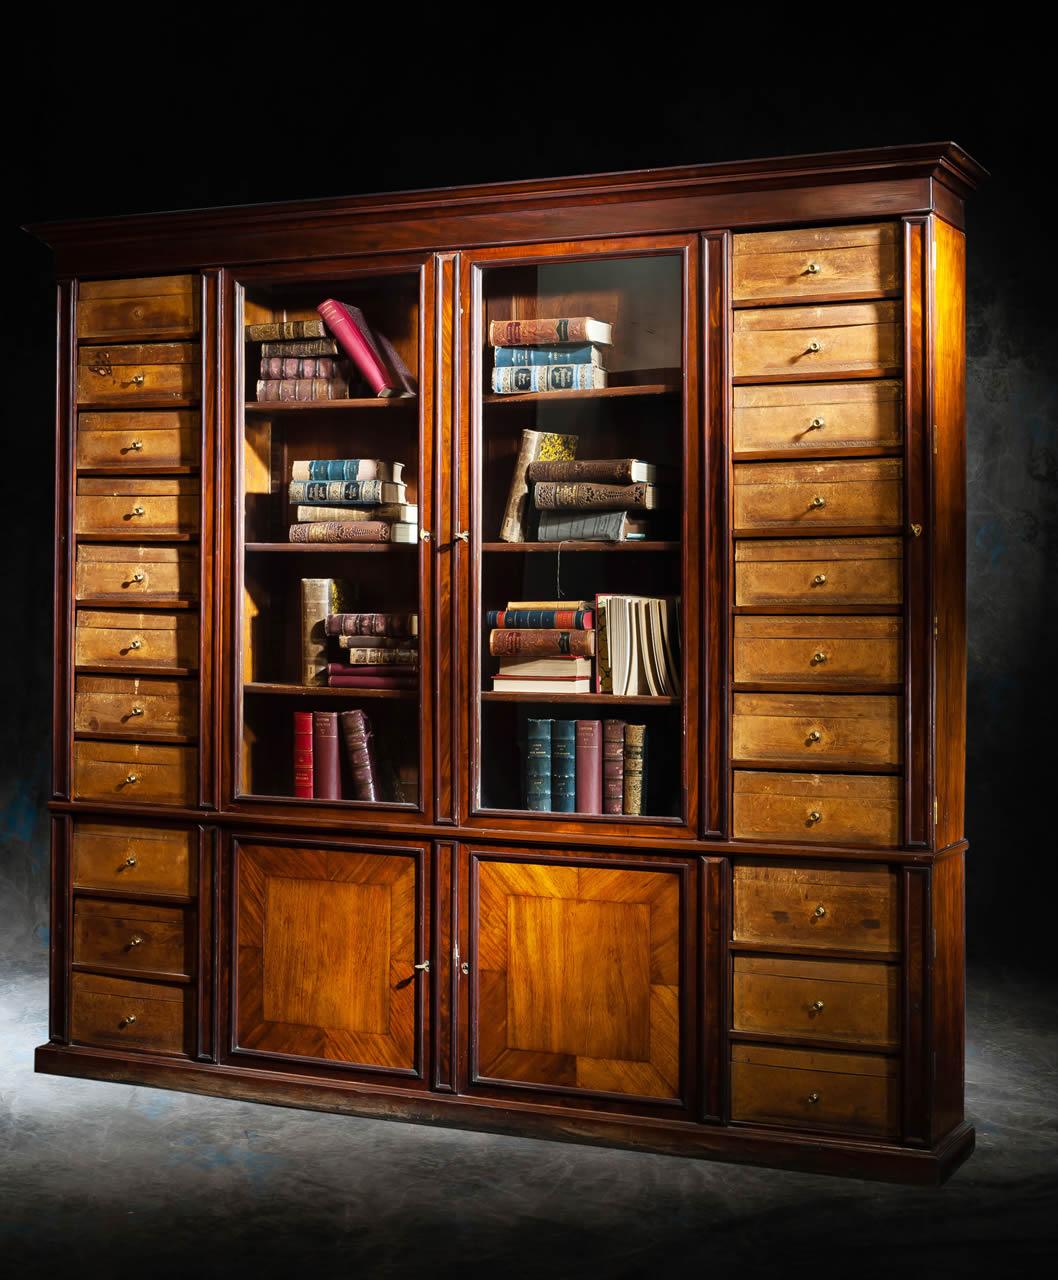 meubles anciens bibliotheque cartonier xix me bertrand klein antiquit s. Black Bedroom Furniture Sets. Home Design Ideas